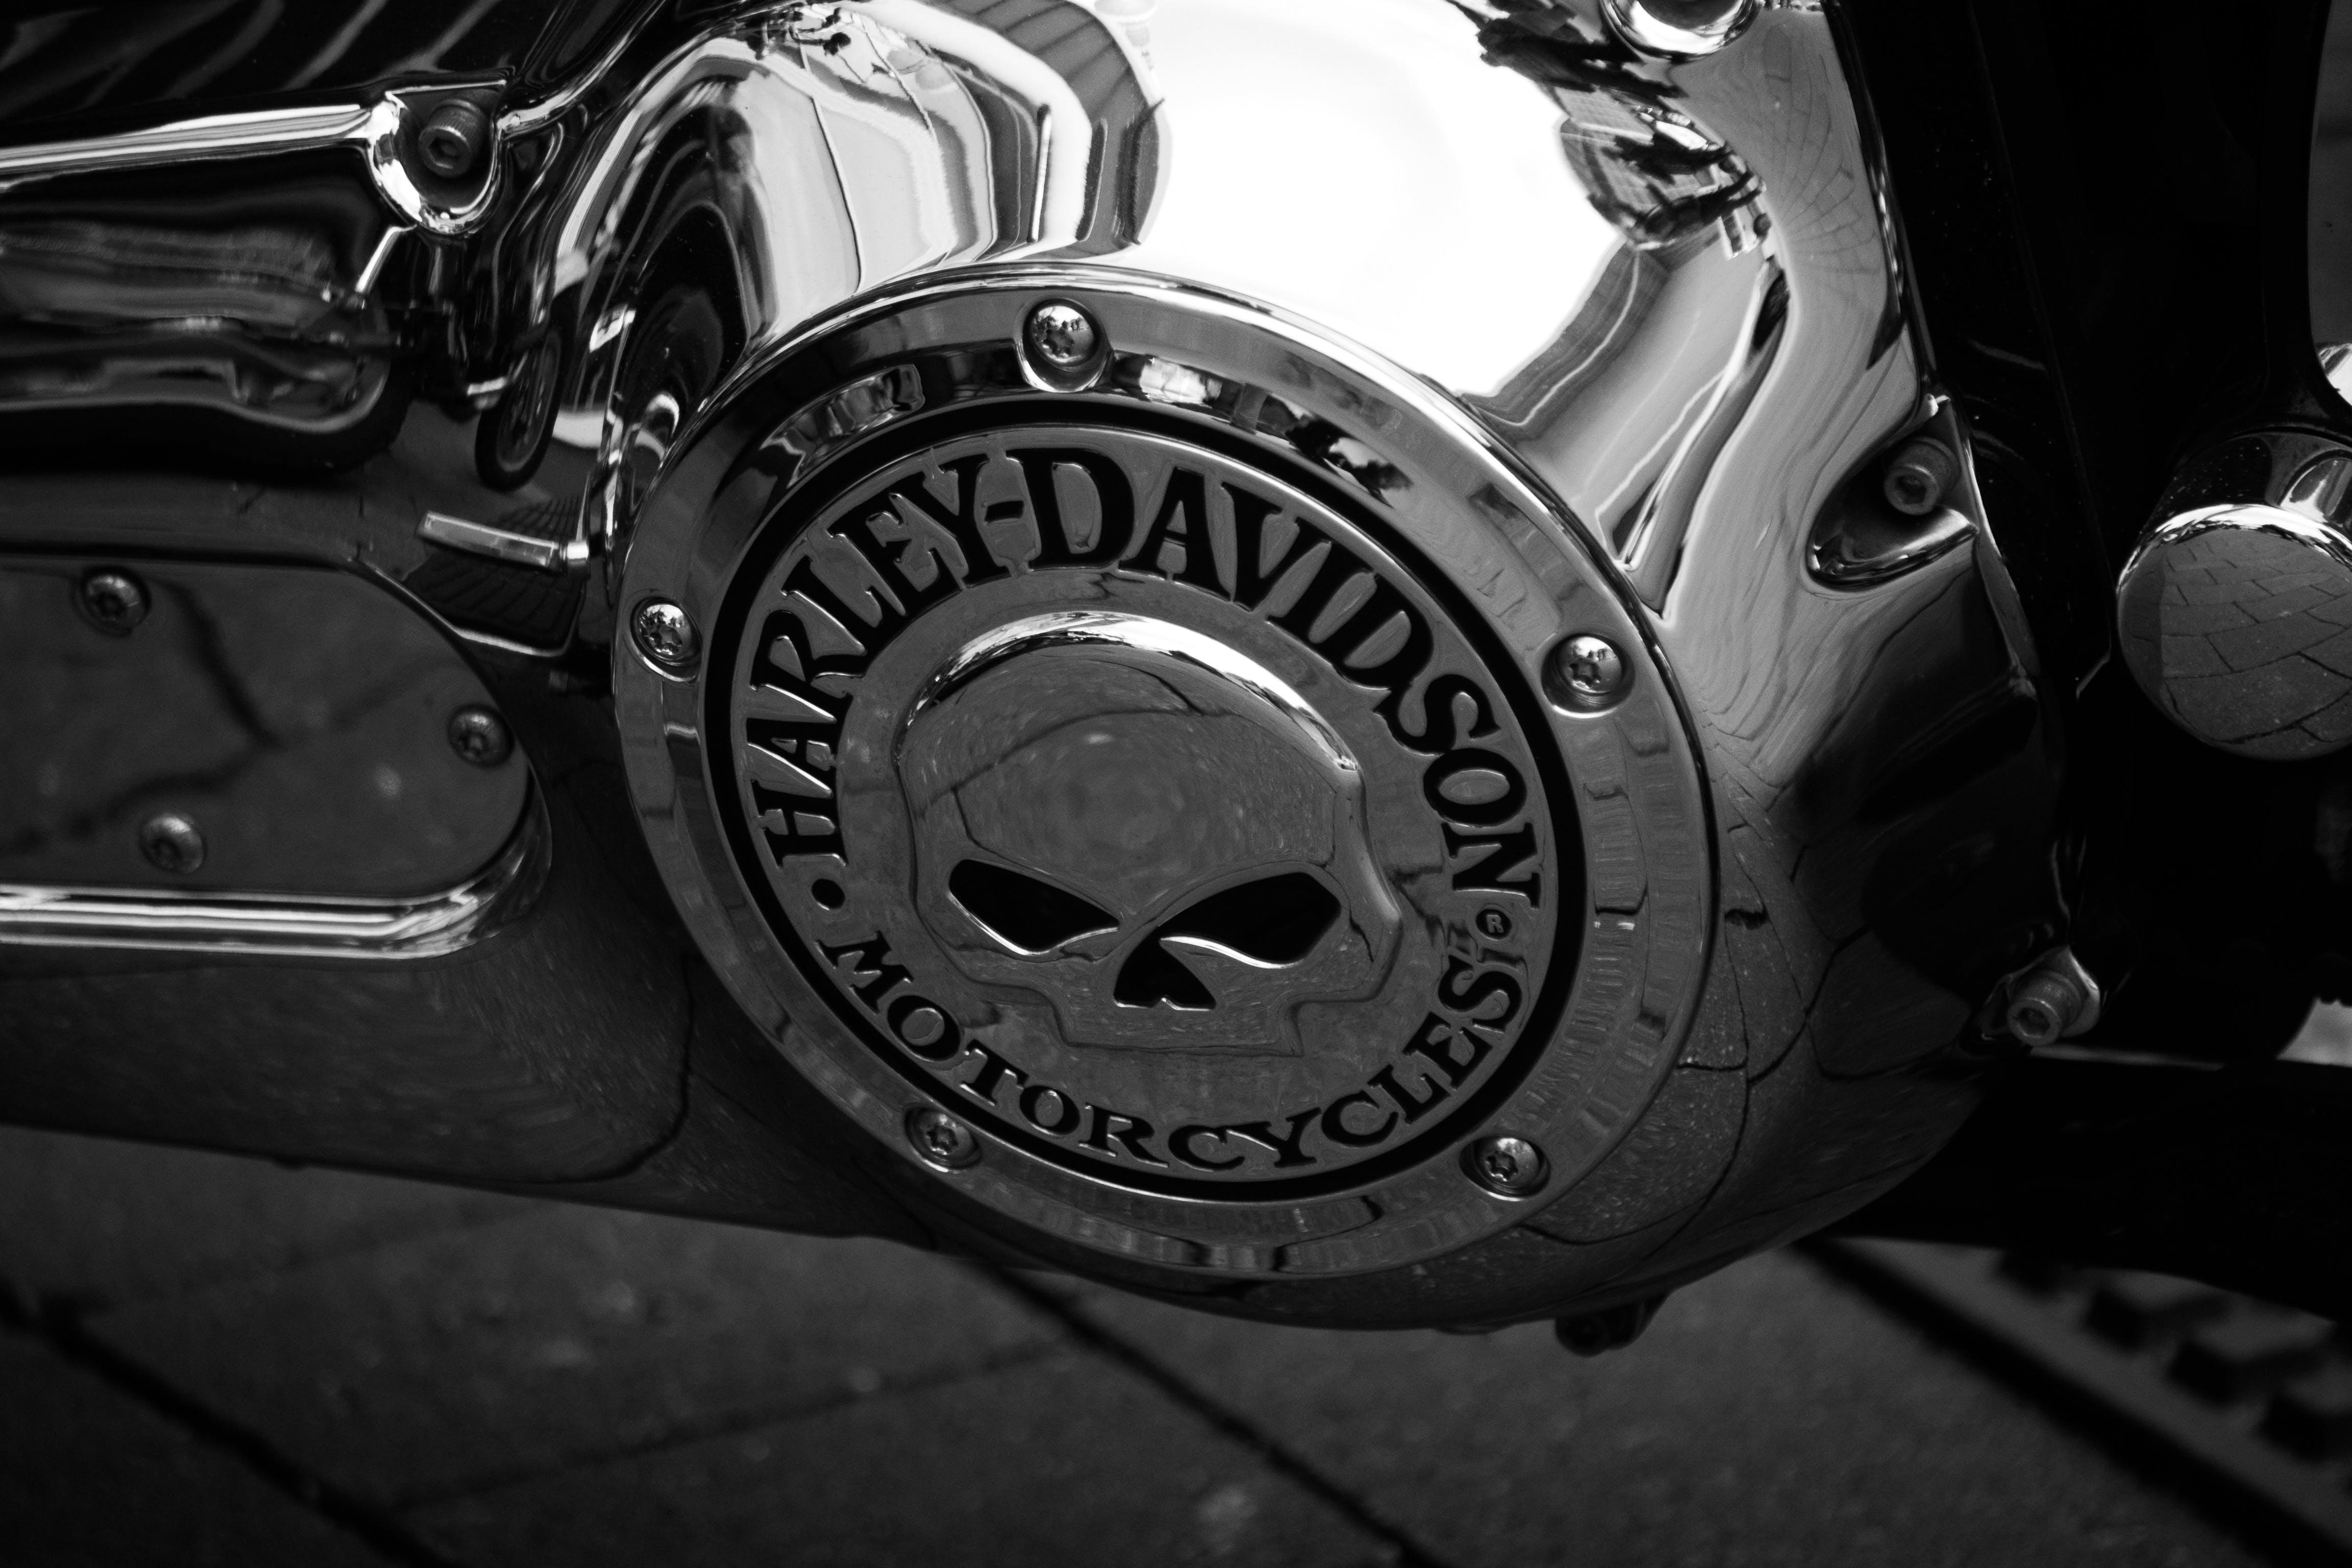 Free stock photo of vintage, bike, bikes, old